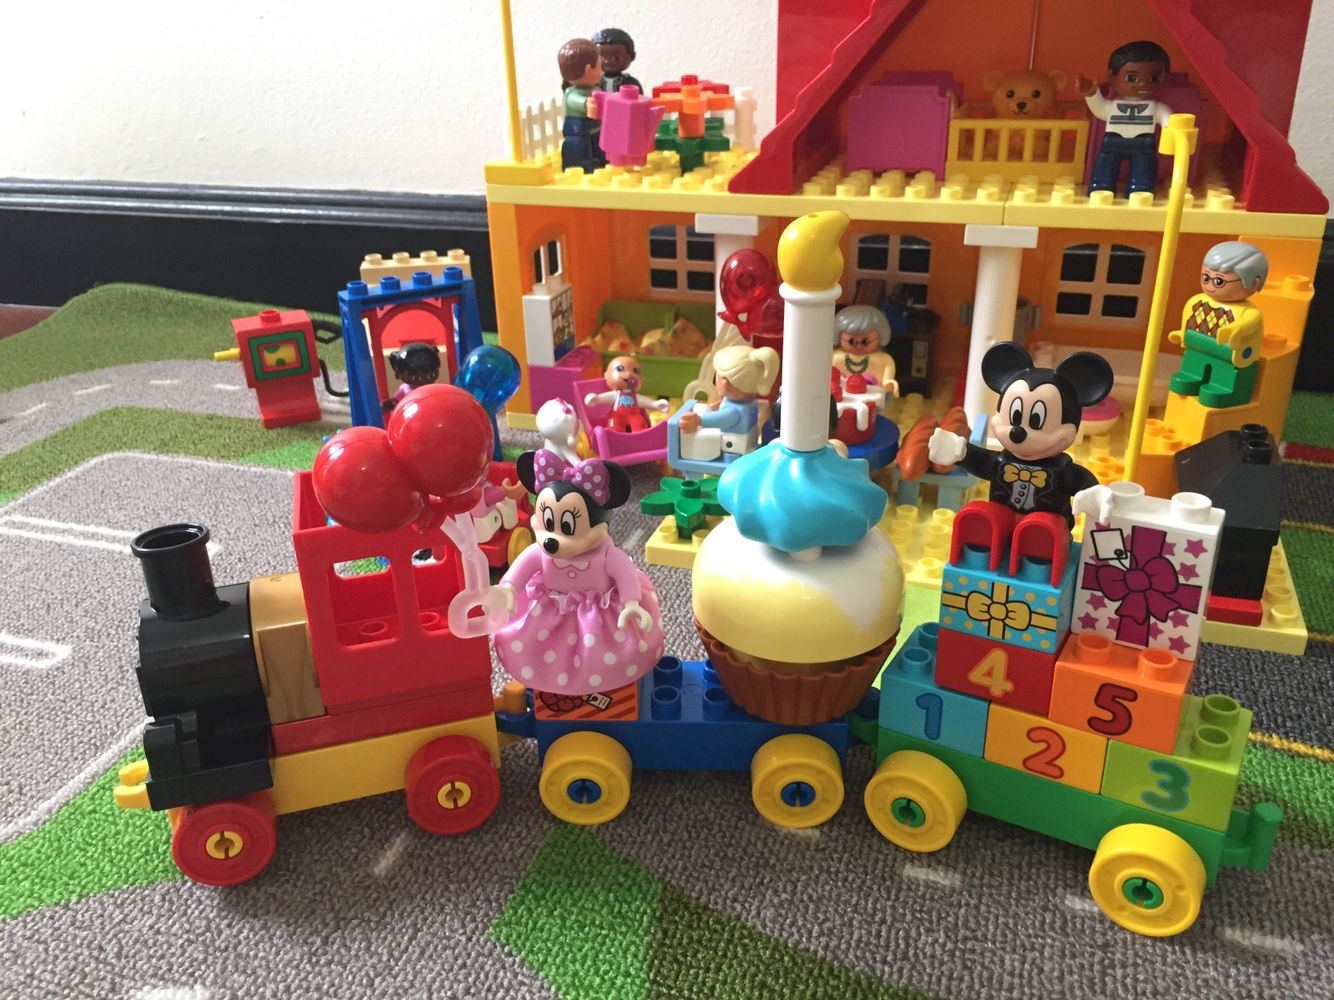 Duplo Mickeymouse Clubhouse 10597 Lego Duplo Duplo Lego